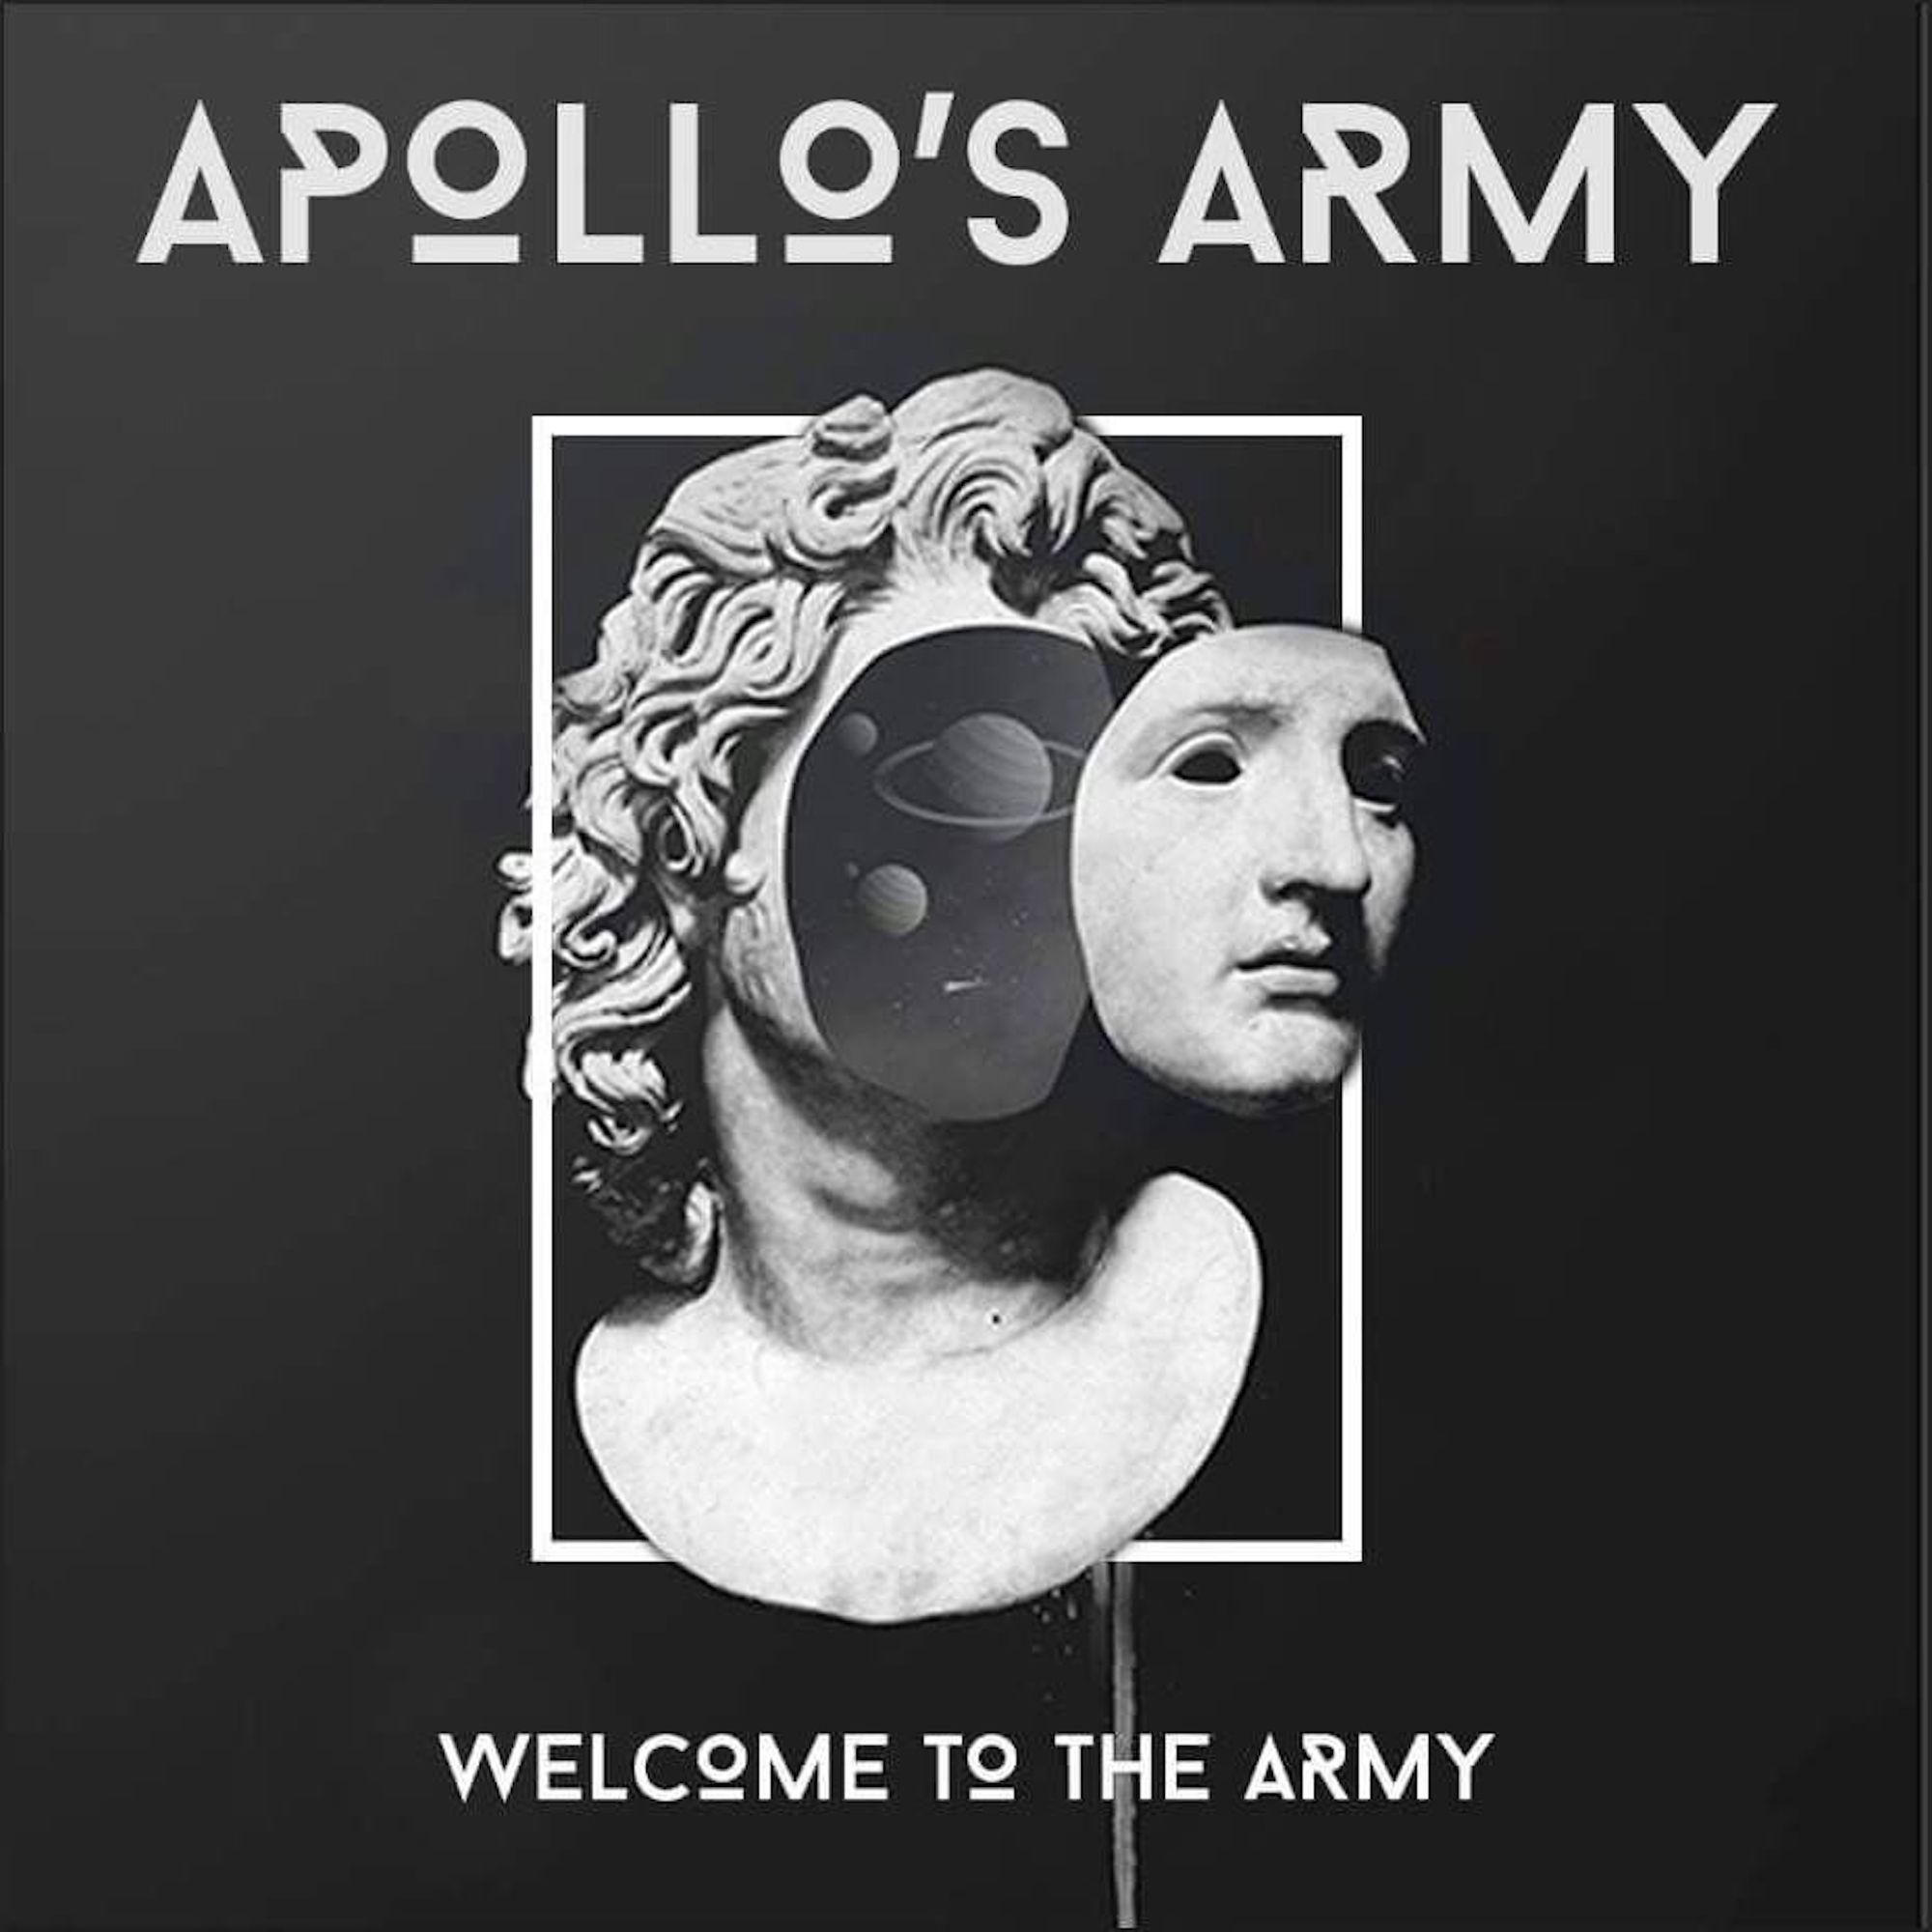 Apollo's Army